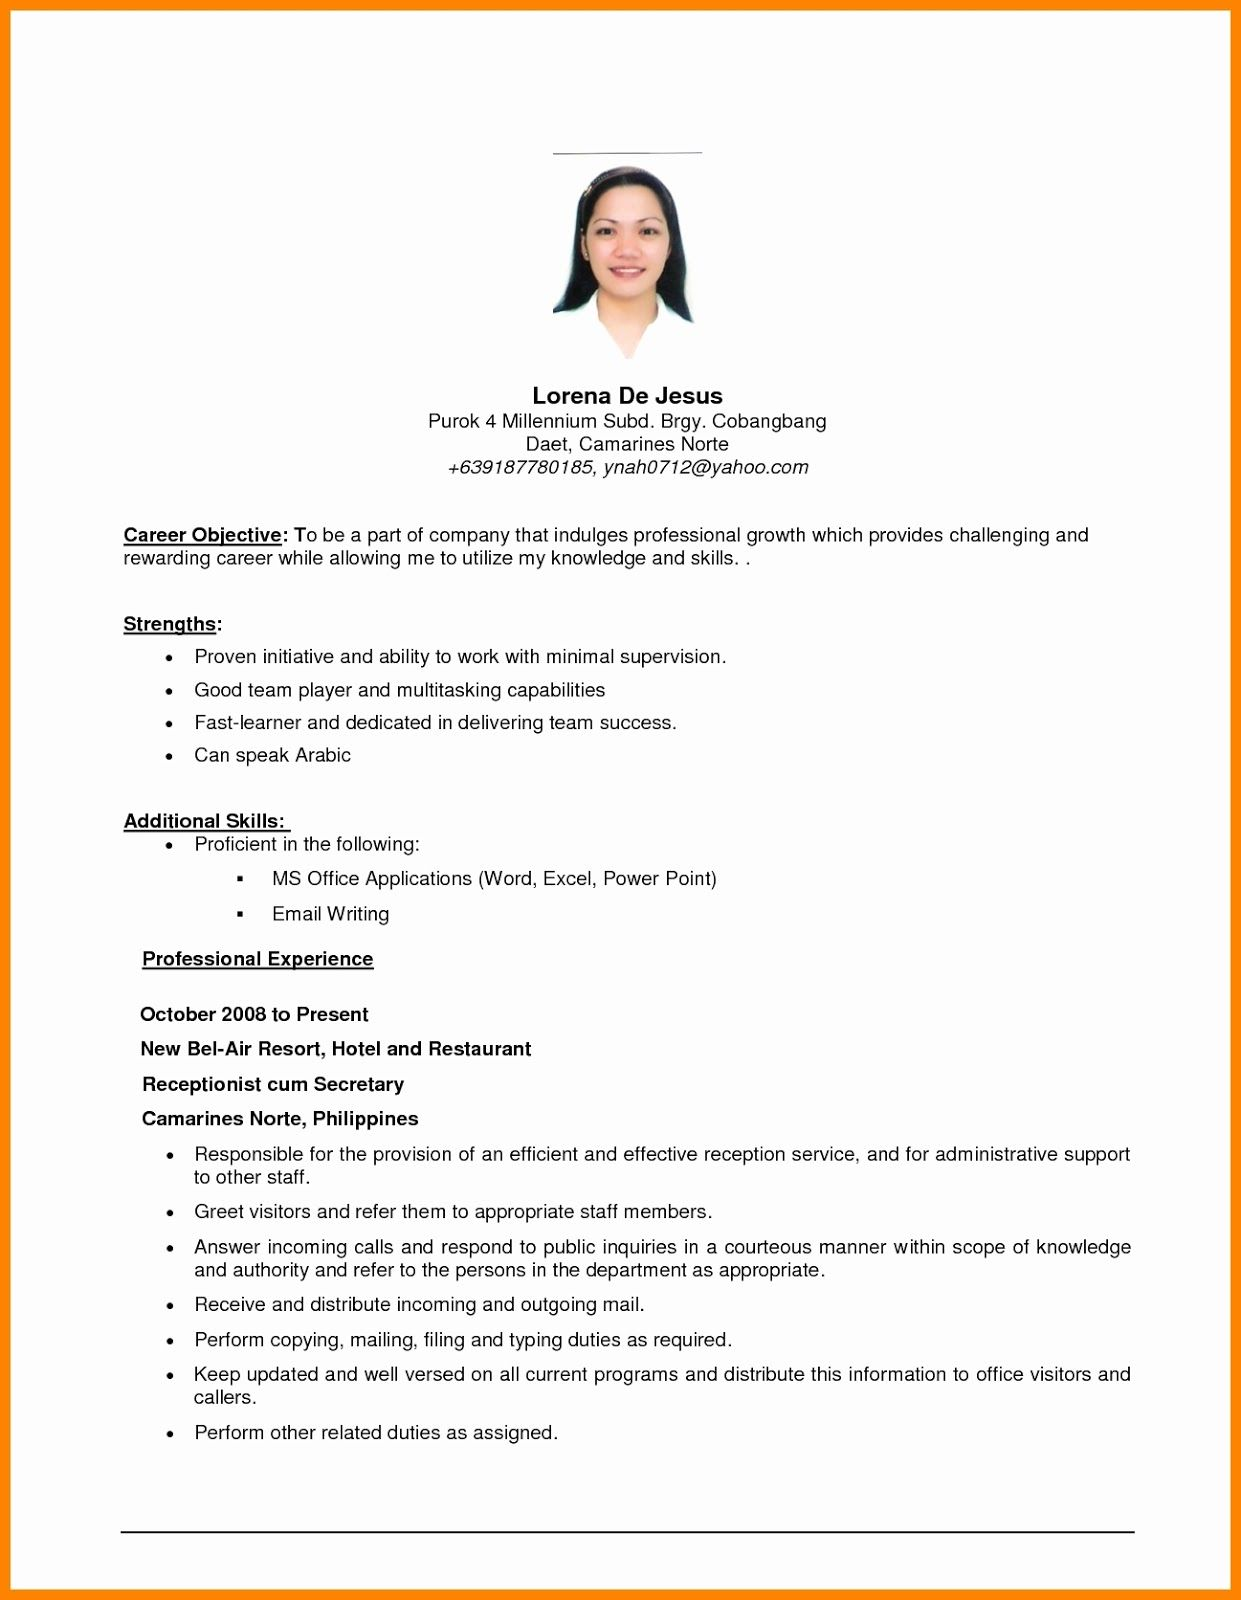 20 Caregiver Job Description Resume in 2020 Caregiver